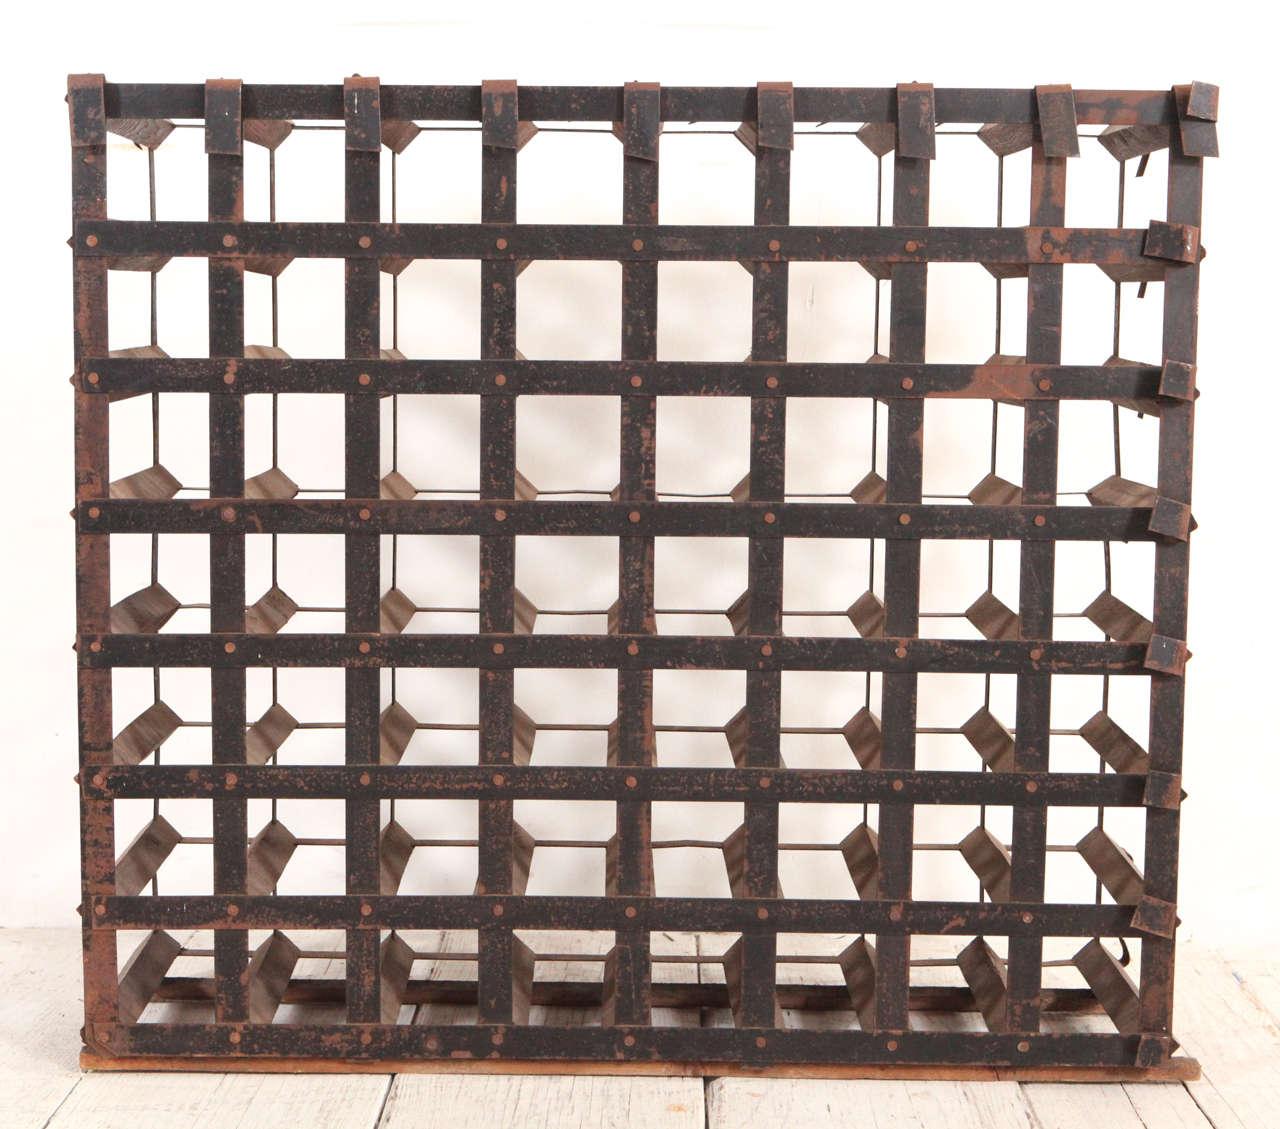 Rustic iron metal bottle rack. Holds 56 bottles.